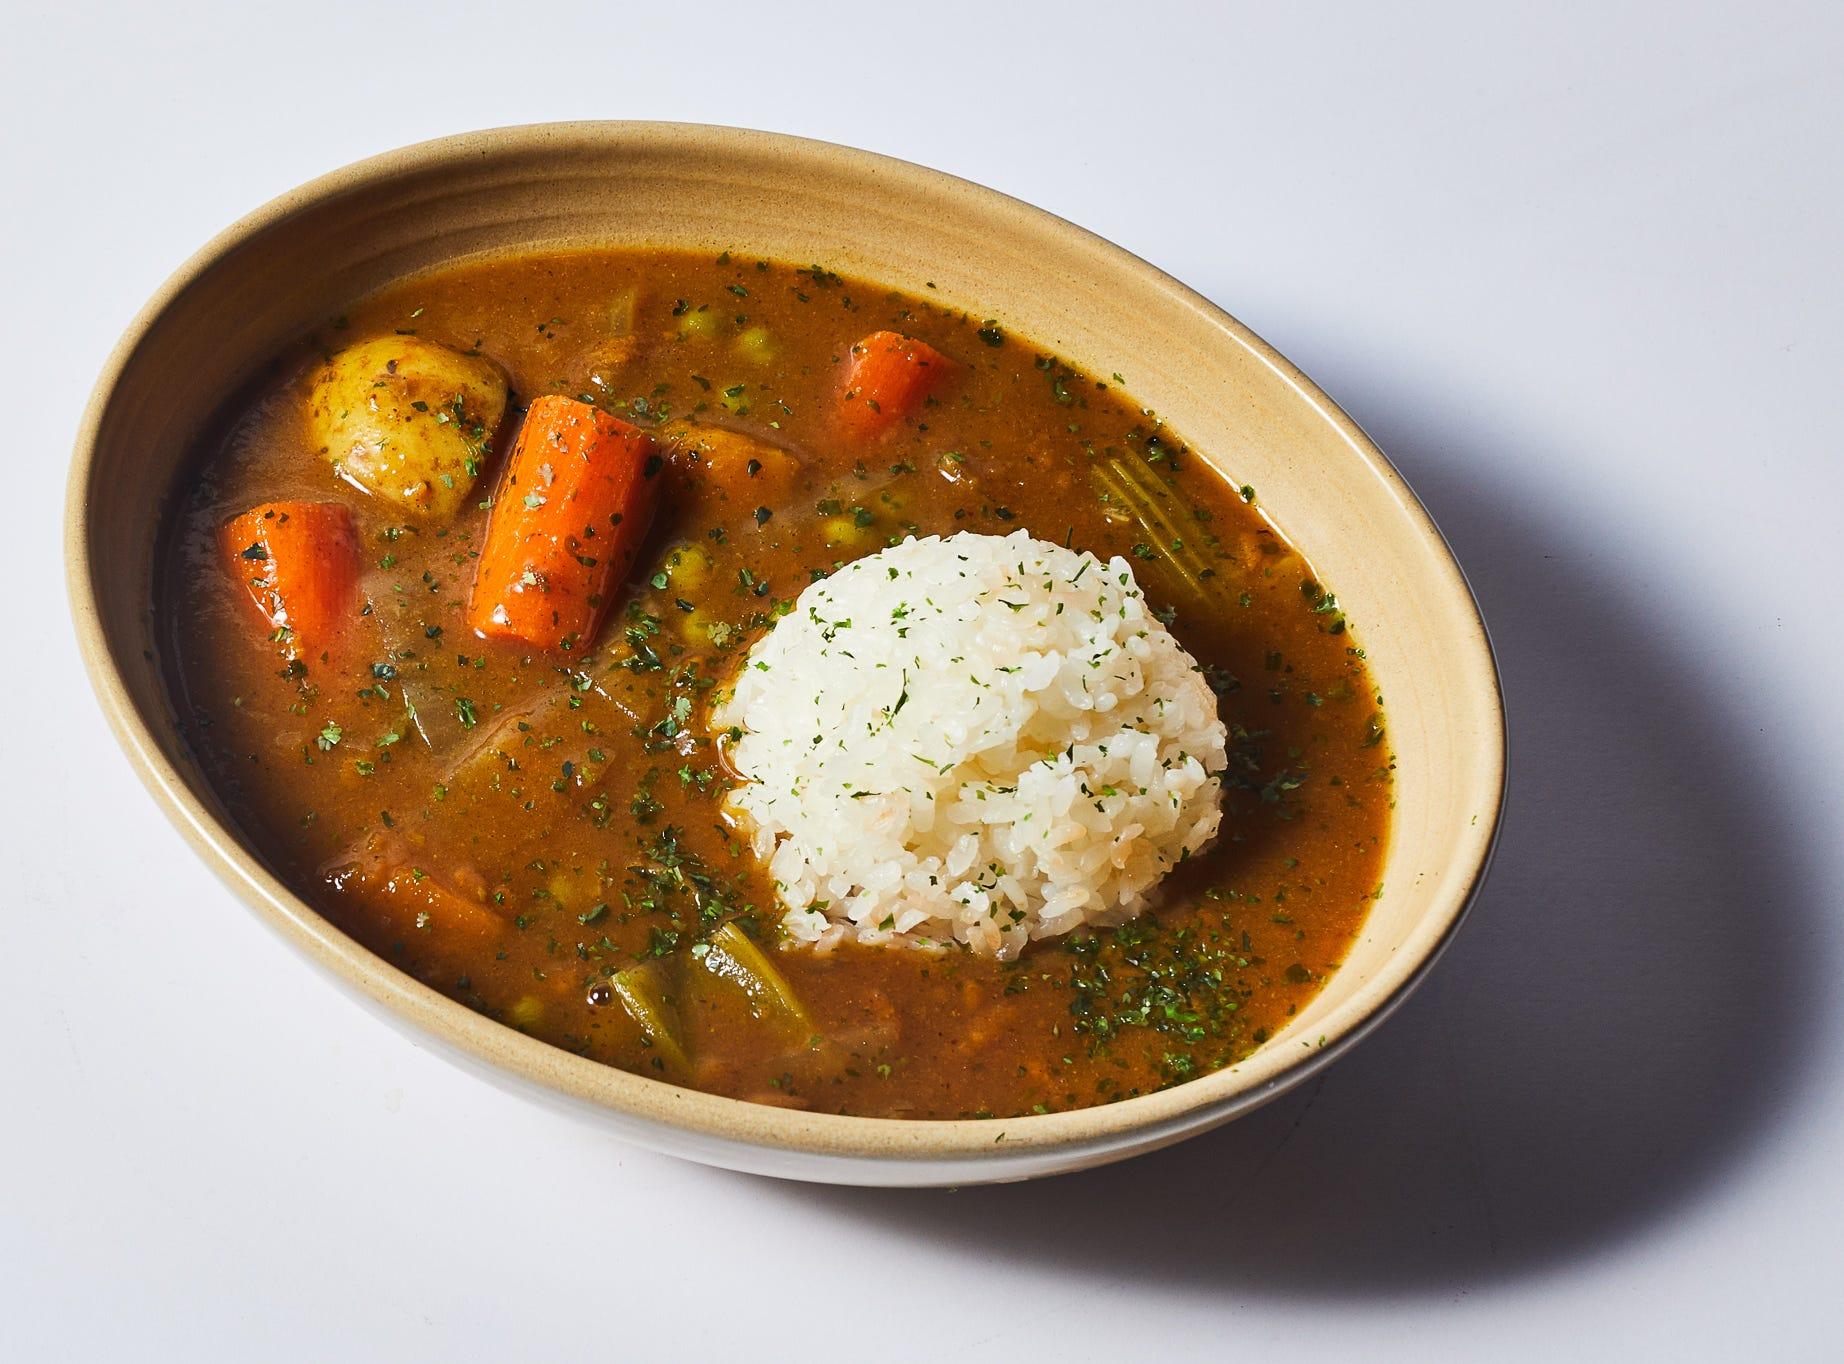 Vegetable curry at Bar Otaku.